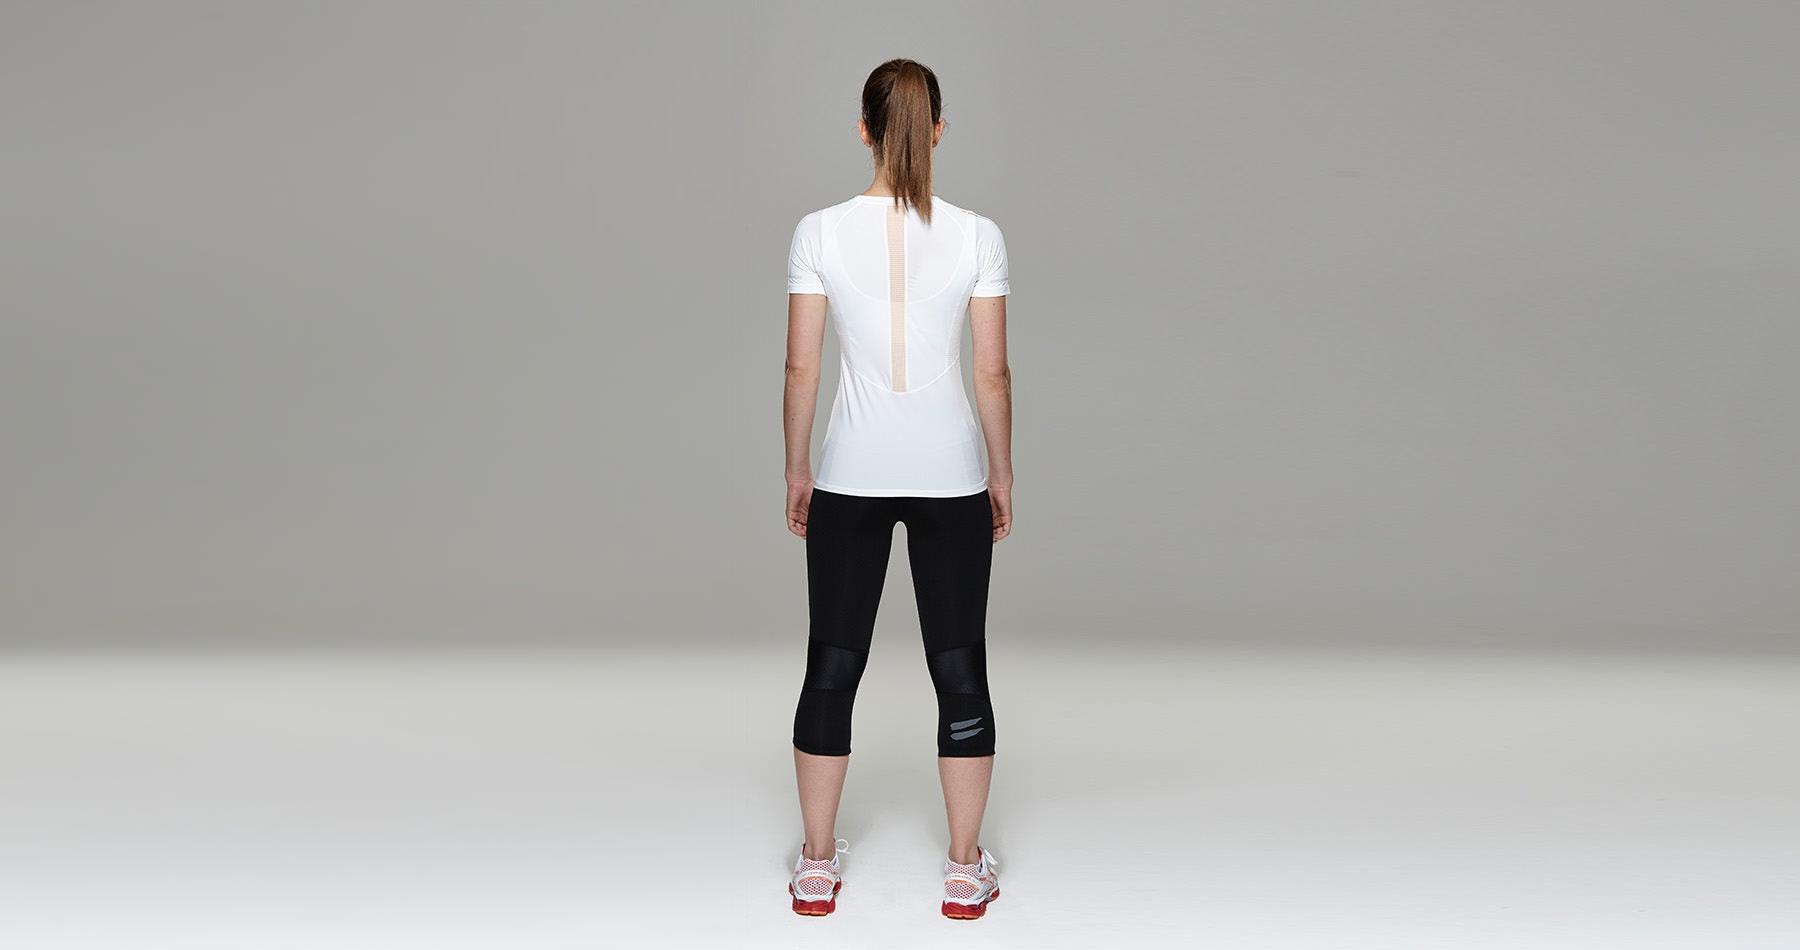 Tribesports Core Women's Short Sleeve Top White Blush  1